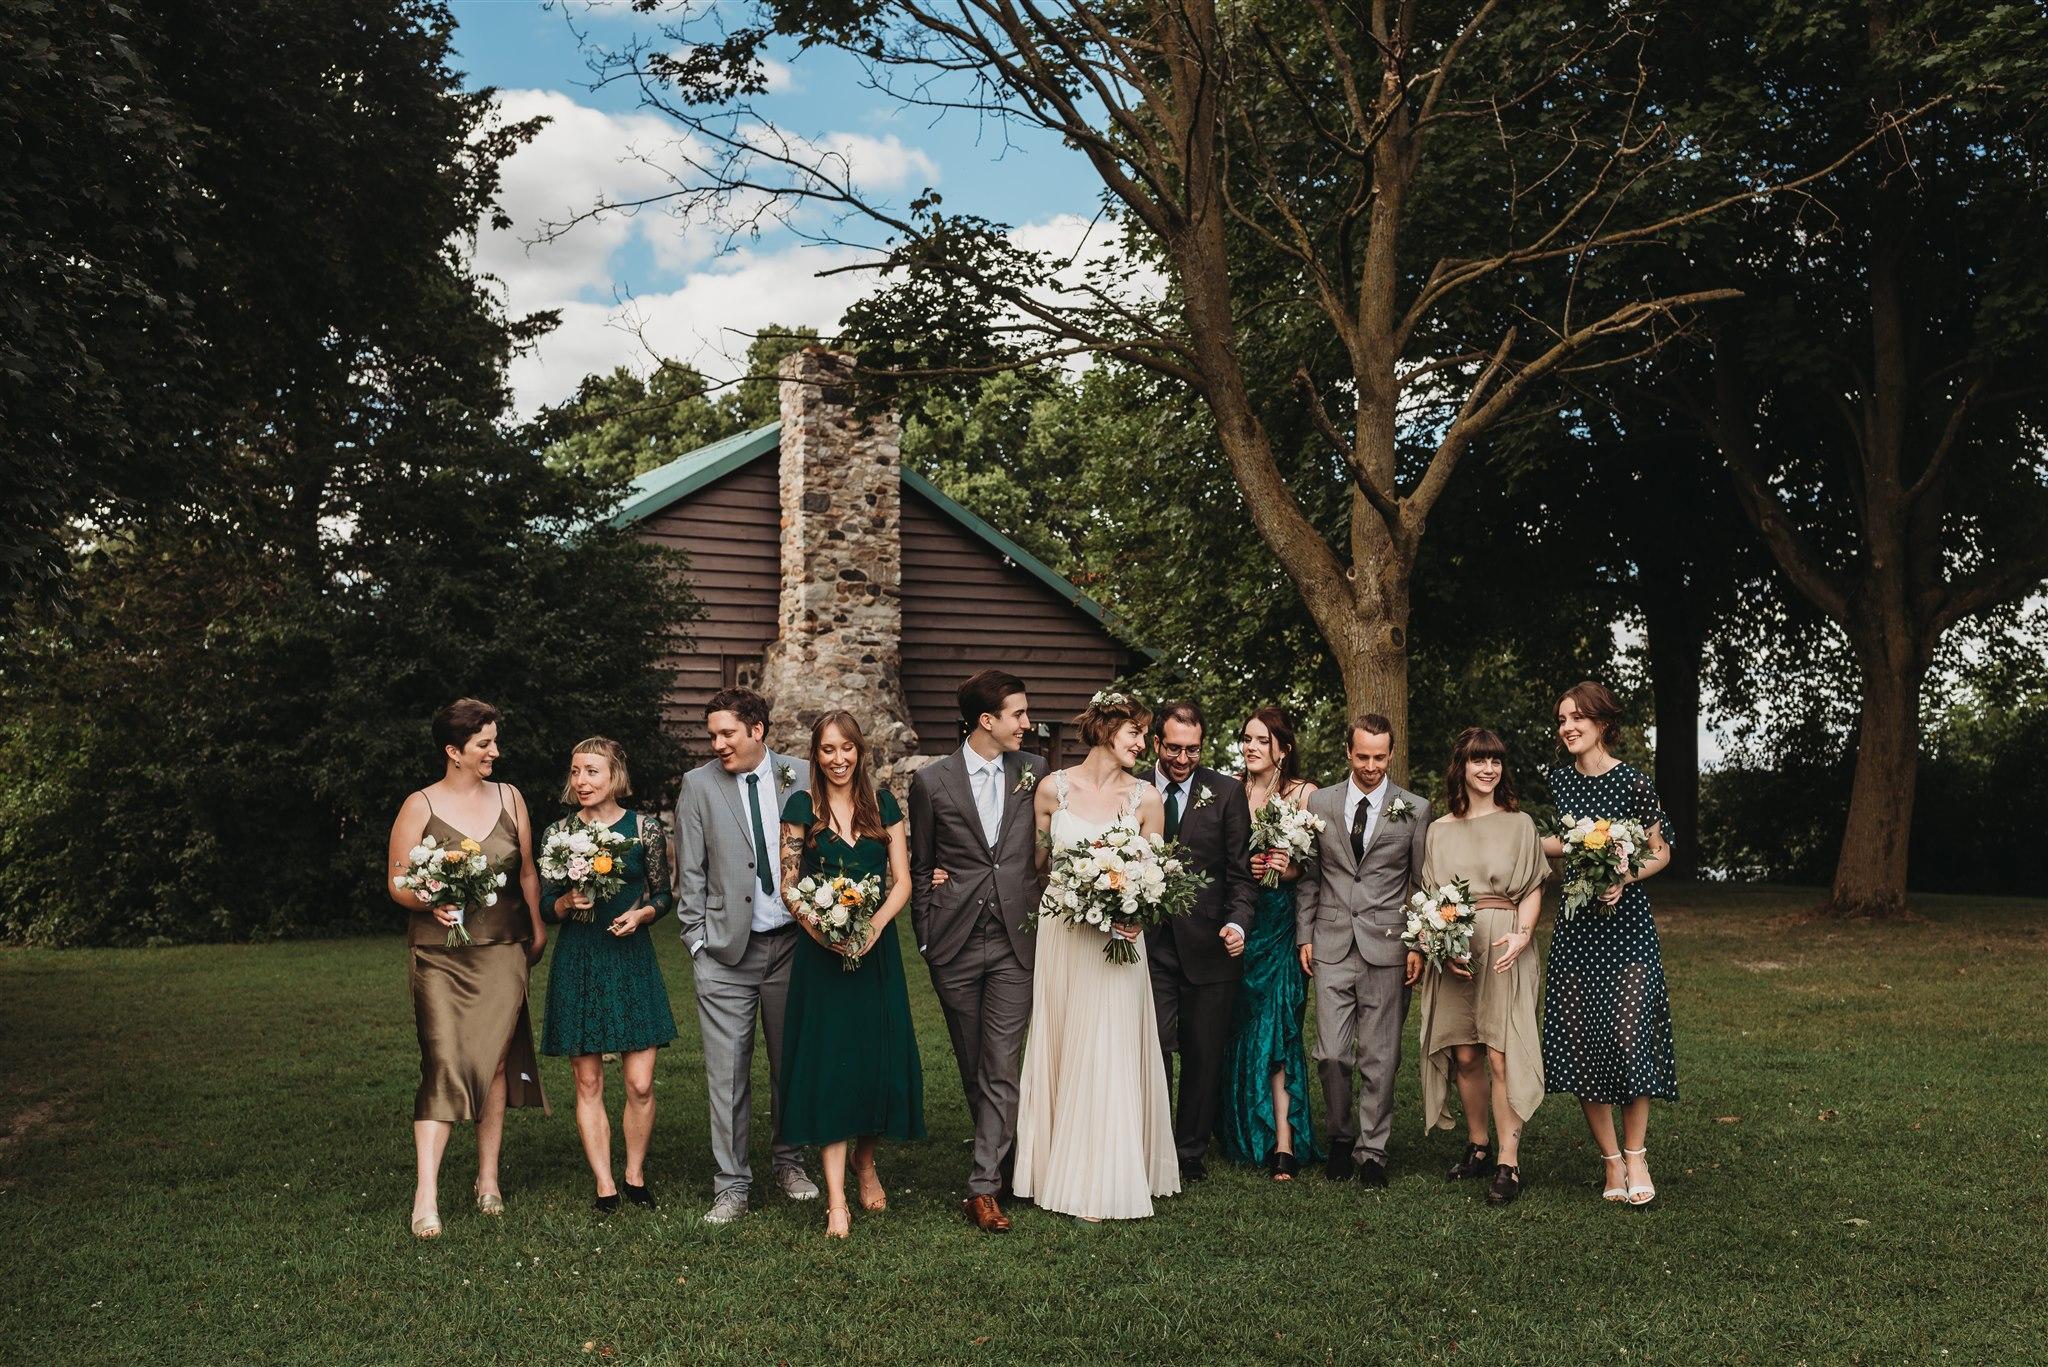 fanshawe conservation area wedding photos 310 1 - Watson Porter Pavillion Wedding